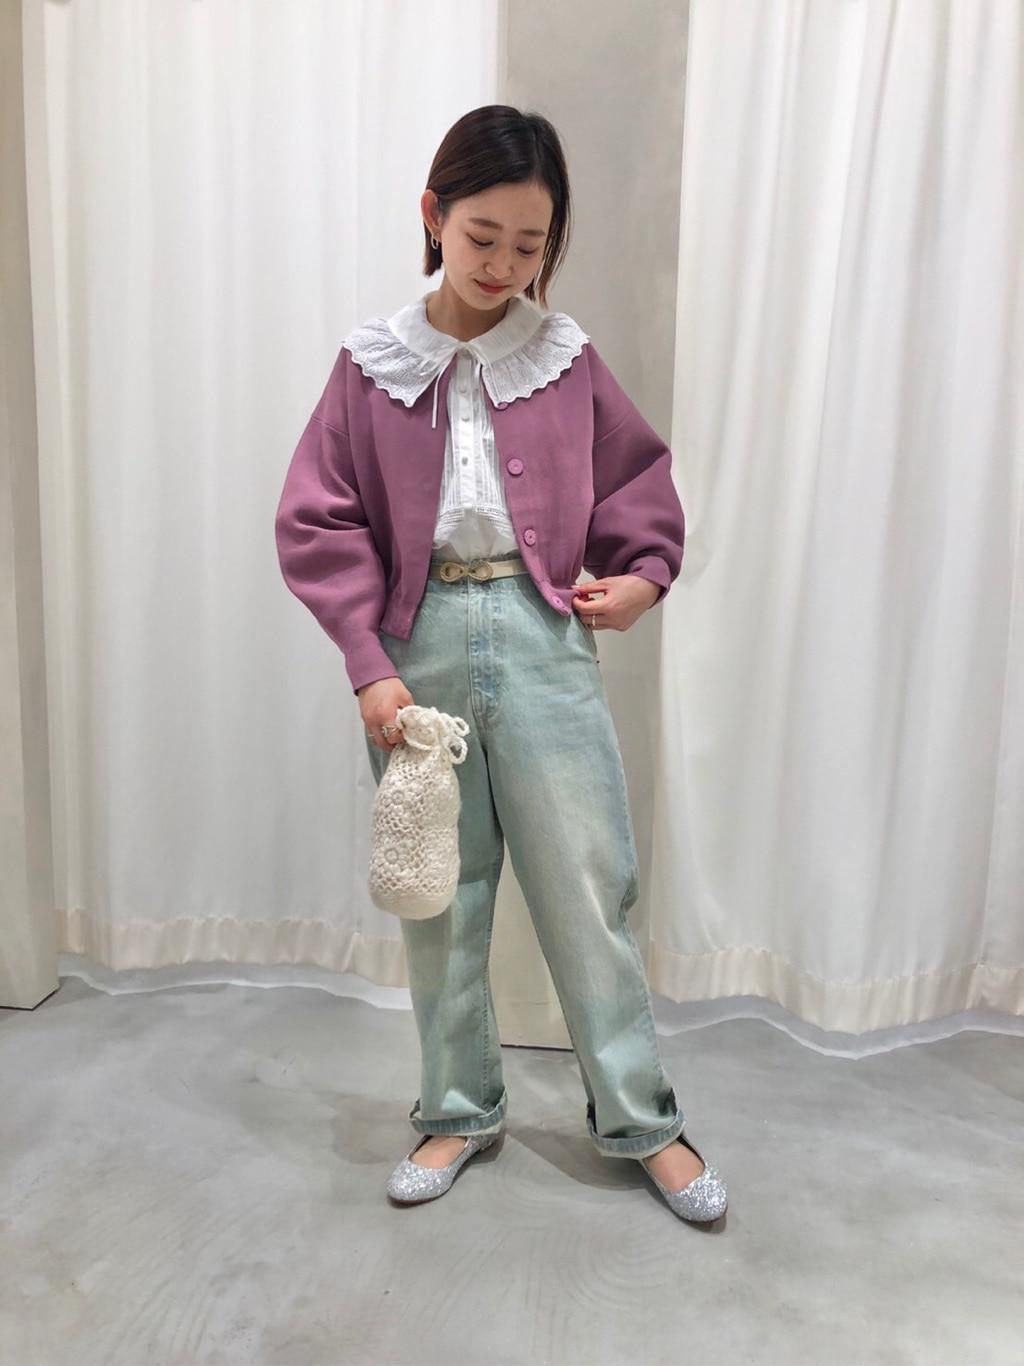 - CHILD WOMAN CHILD WOMAN , PAR ICI 東京スカイツリータウン・ソラマチ 身長:150cm 2020.09.30